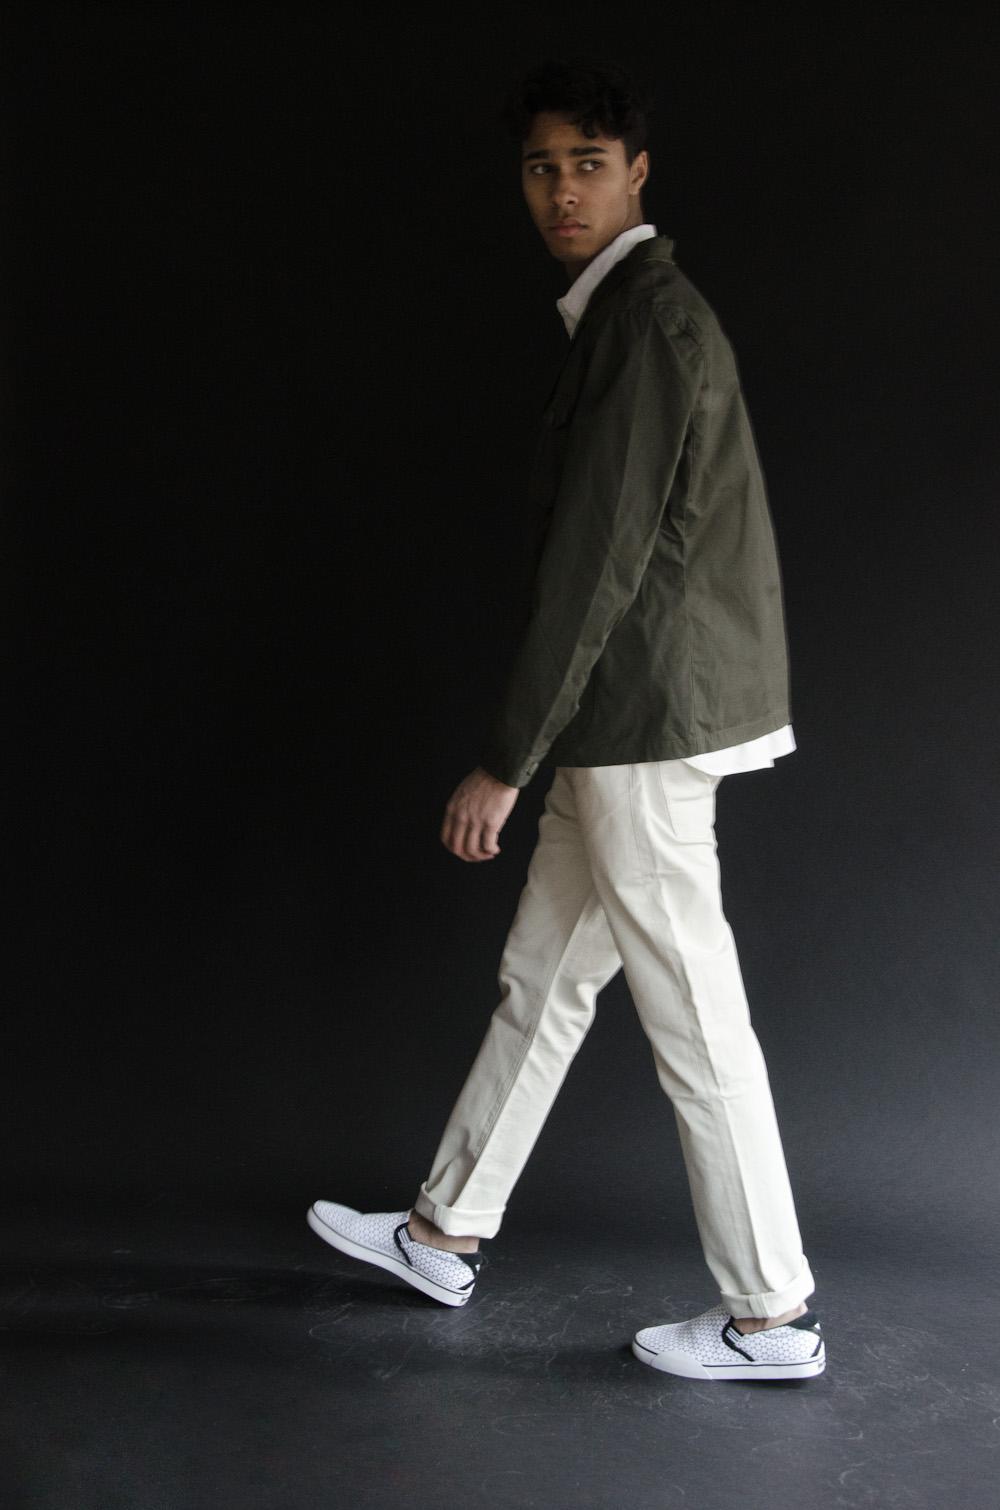 Deus The Stan Shirt    Penfield Reddington Blazer    Adidas  Gonz Slip-On